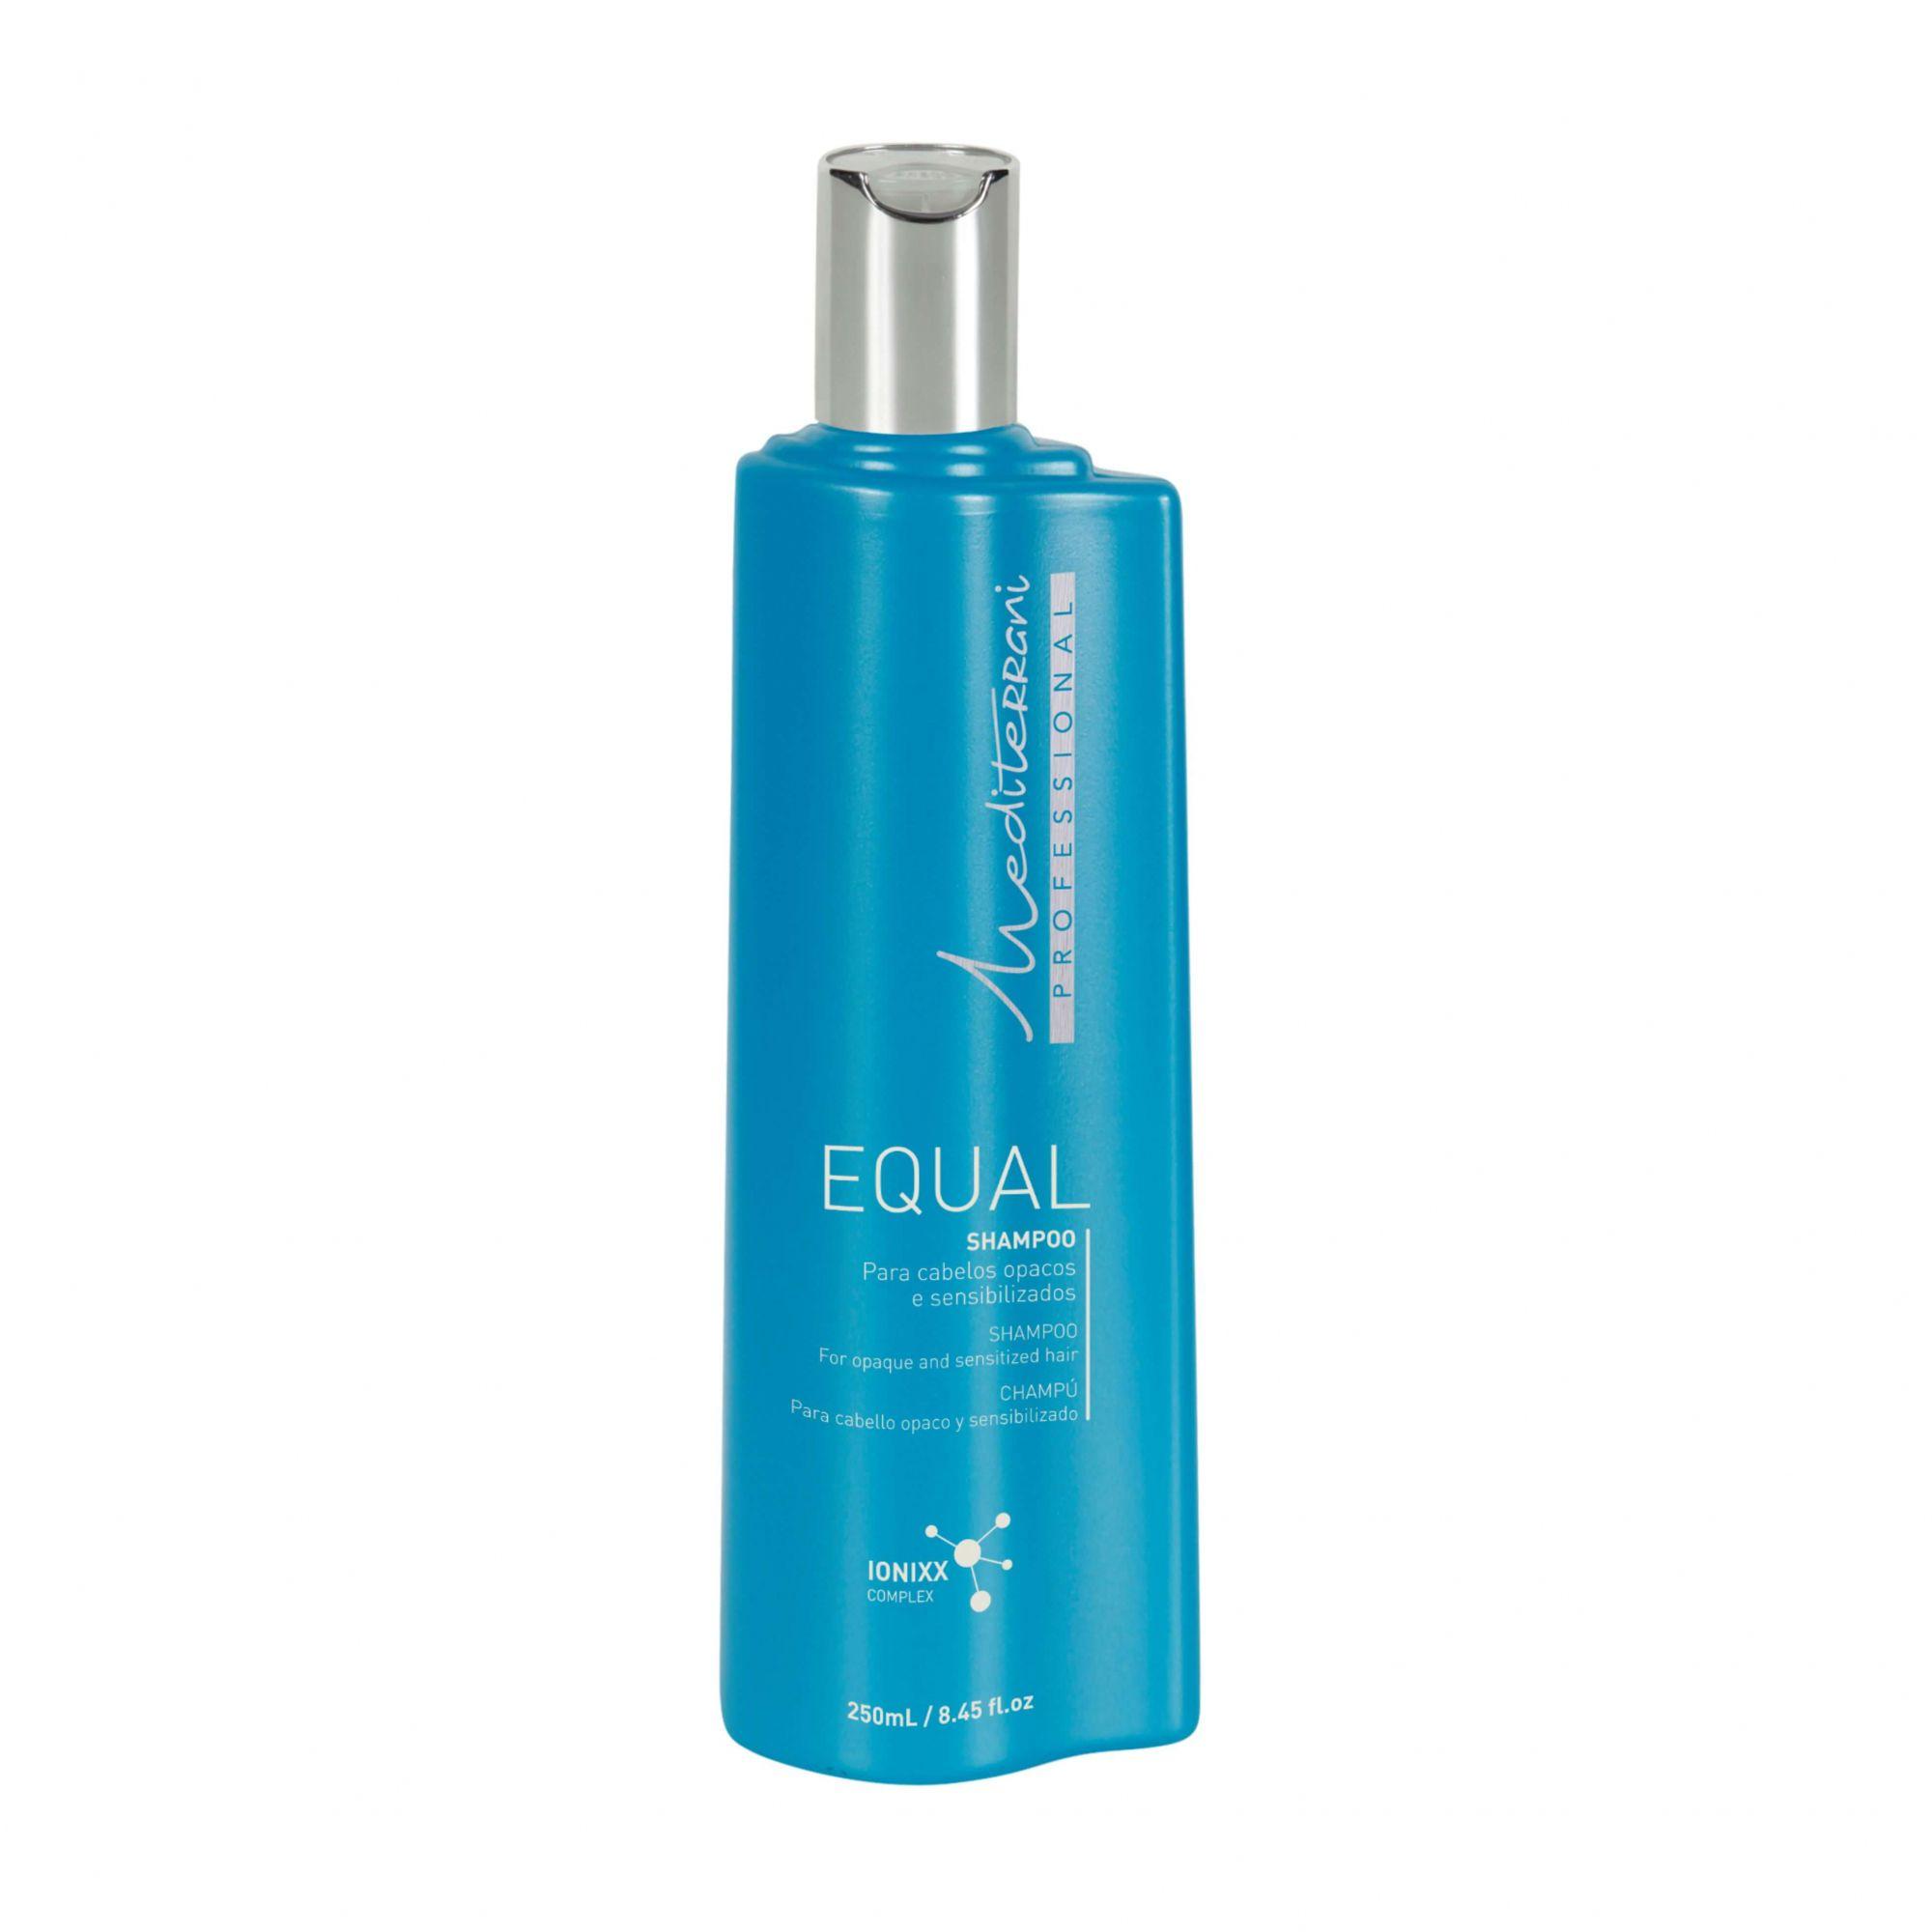 Shampoo Ionixx Equal Mediterrani 250ml